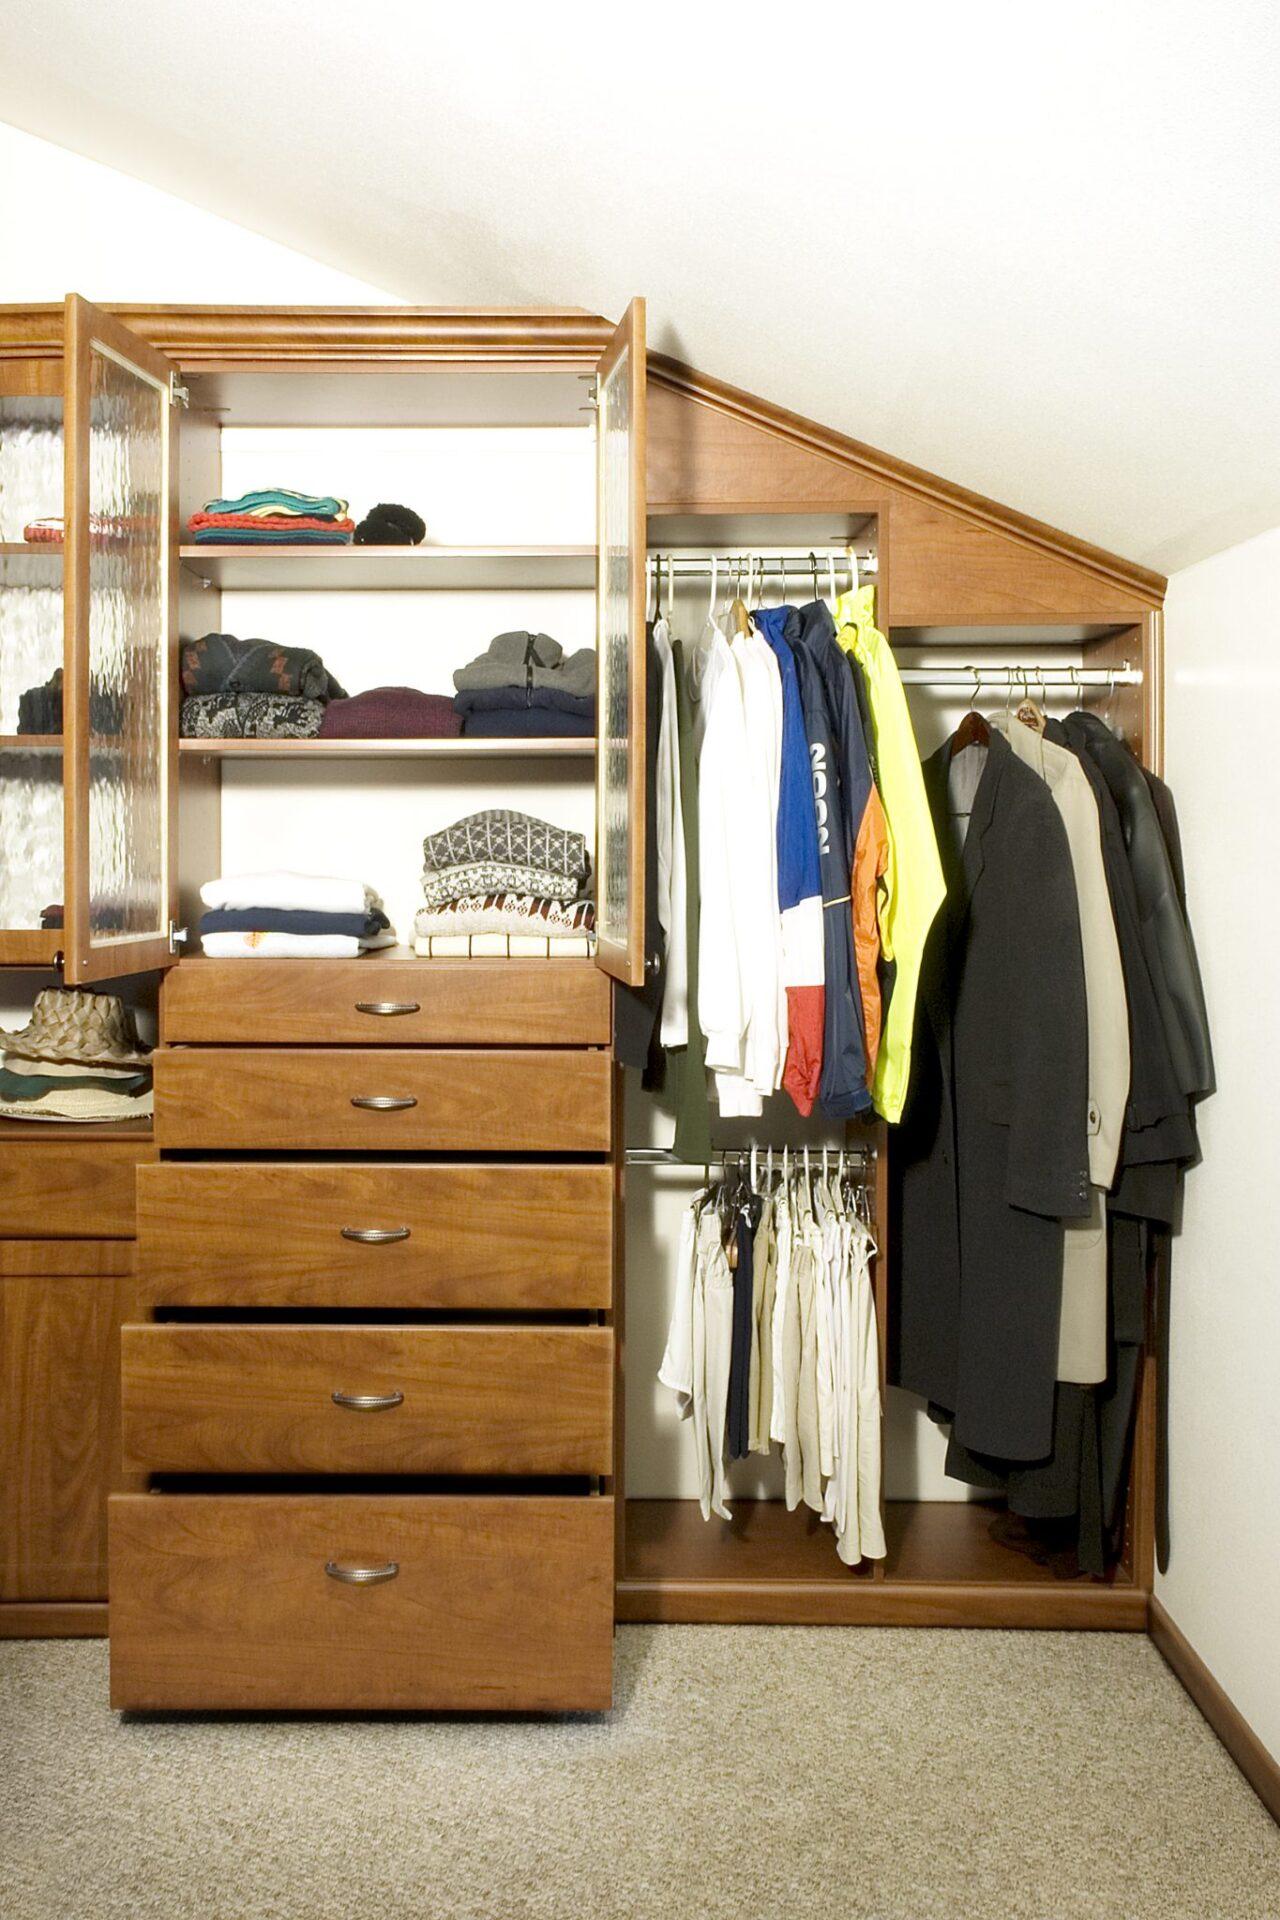 Walk In Closet, Custom Closet, Small Space Experts, SmartSpaces.com